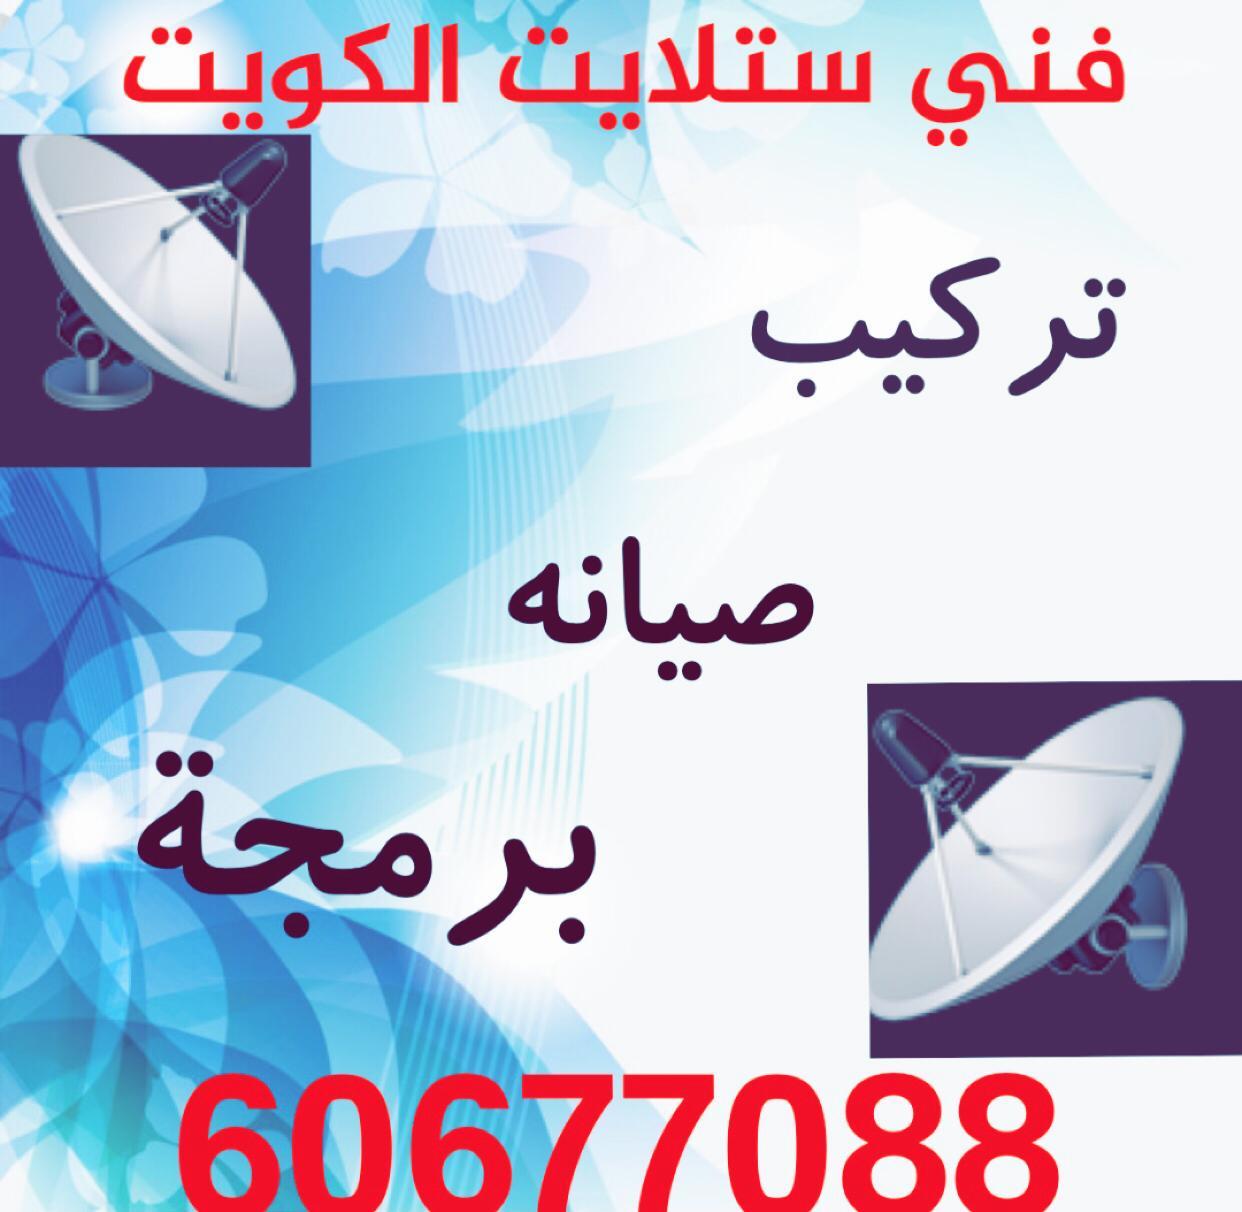 Photo of فني ستلايت الخالدية 60677088 ستلايت الخالديه